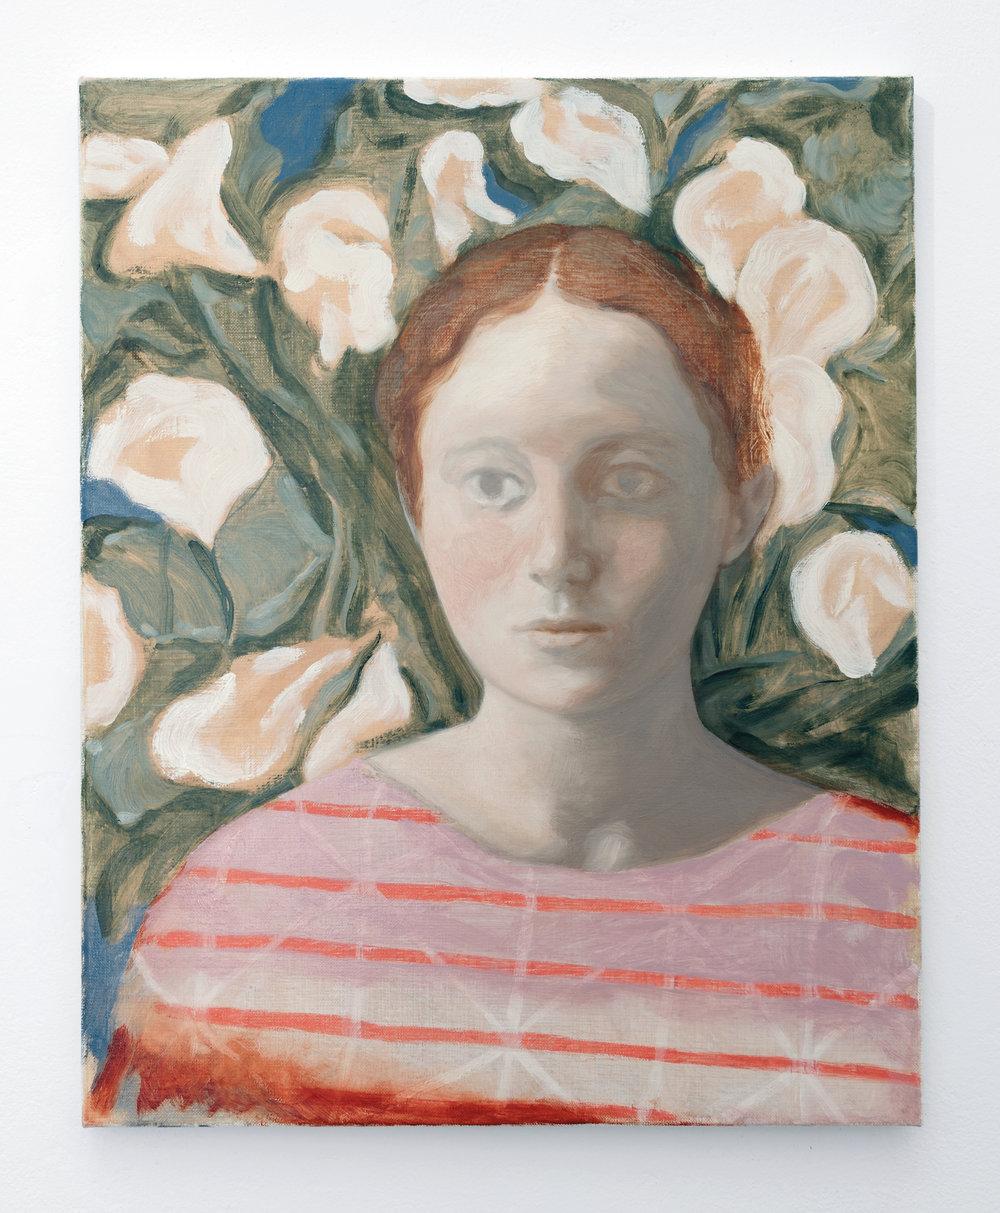 Calla lilies , 2018 Oil on linen, 50.5cm x 40cm